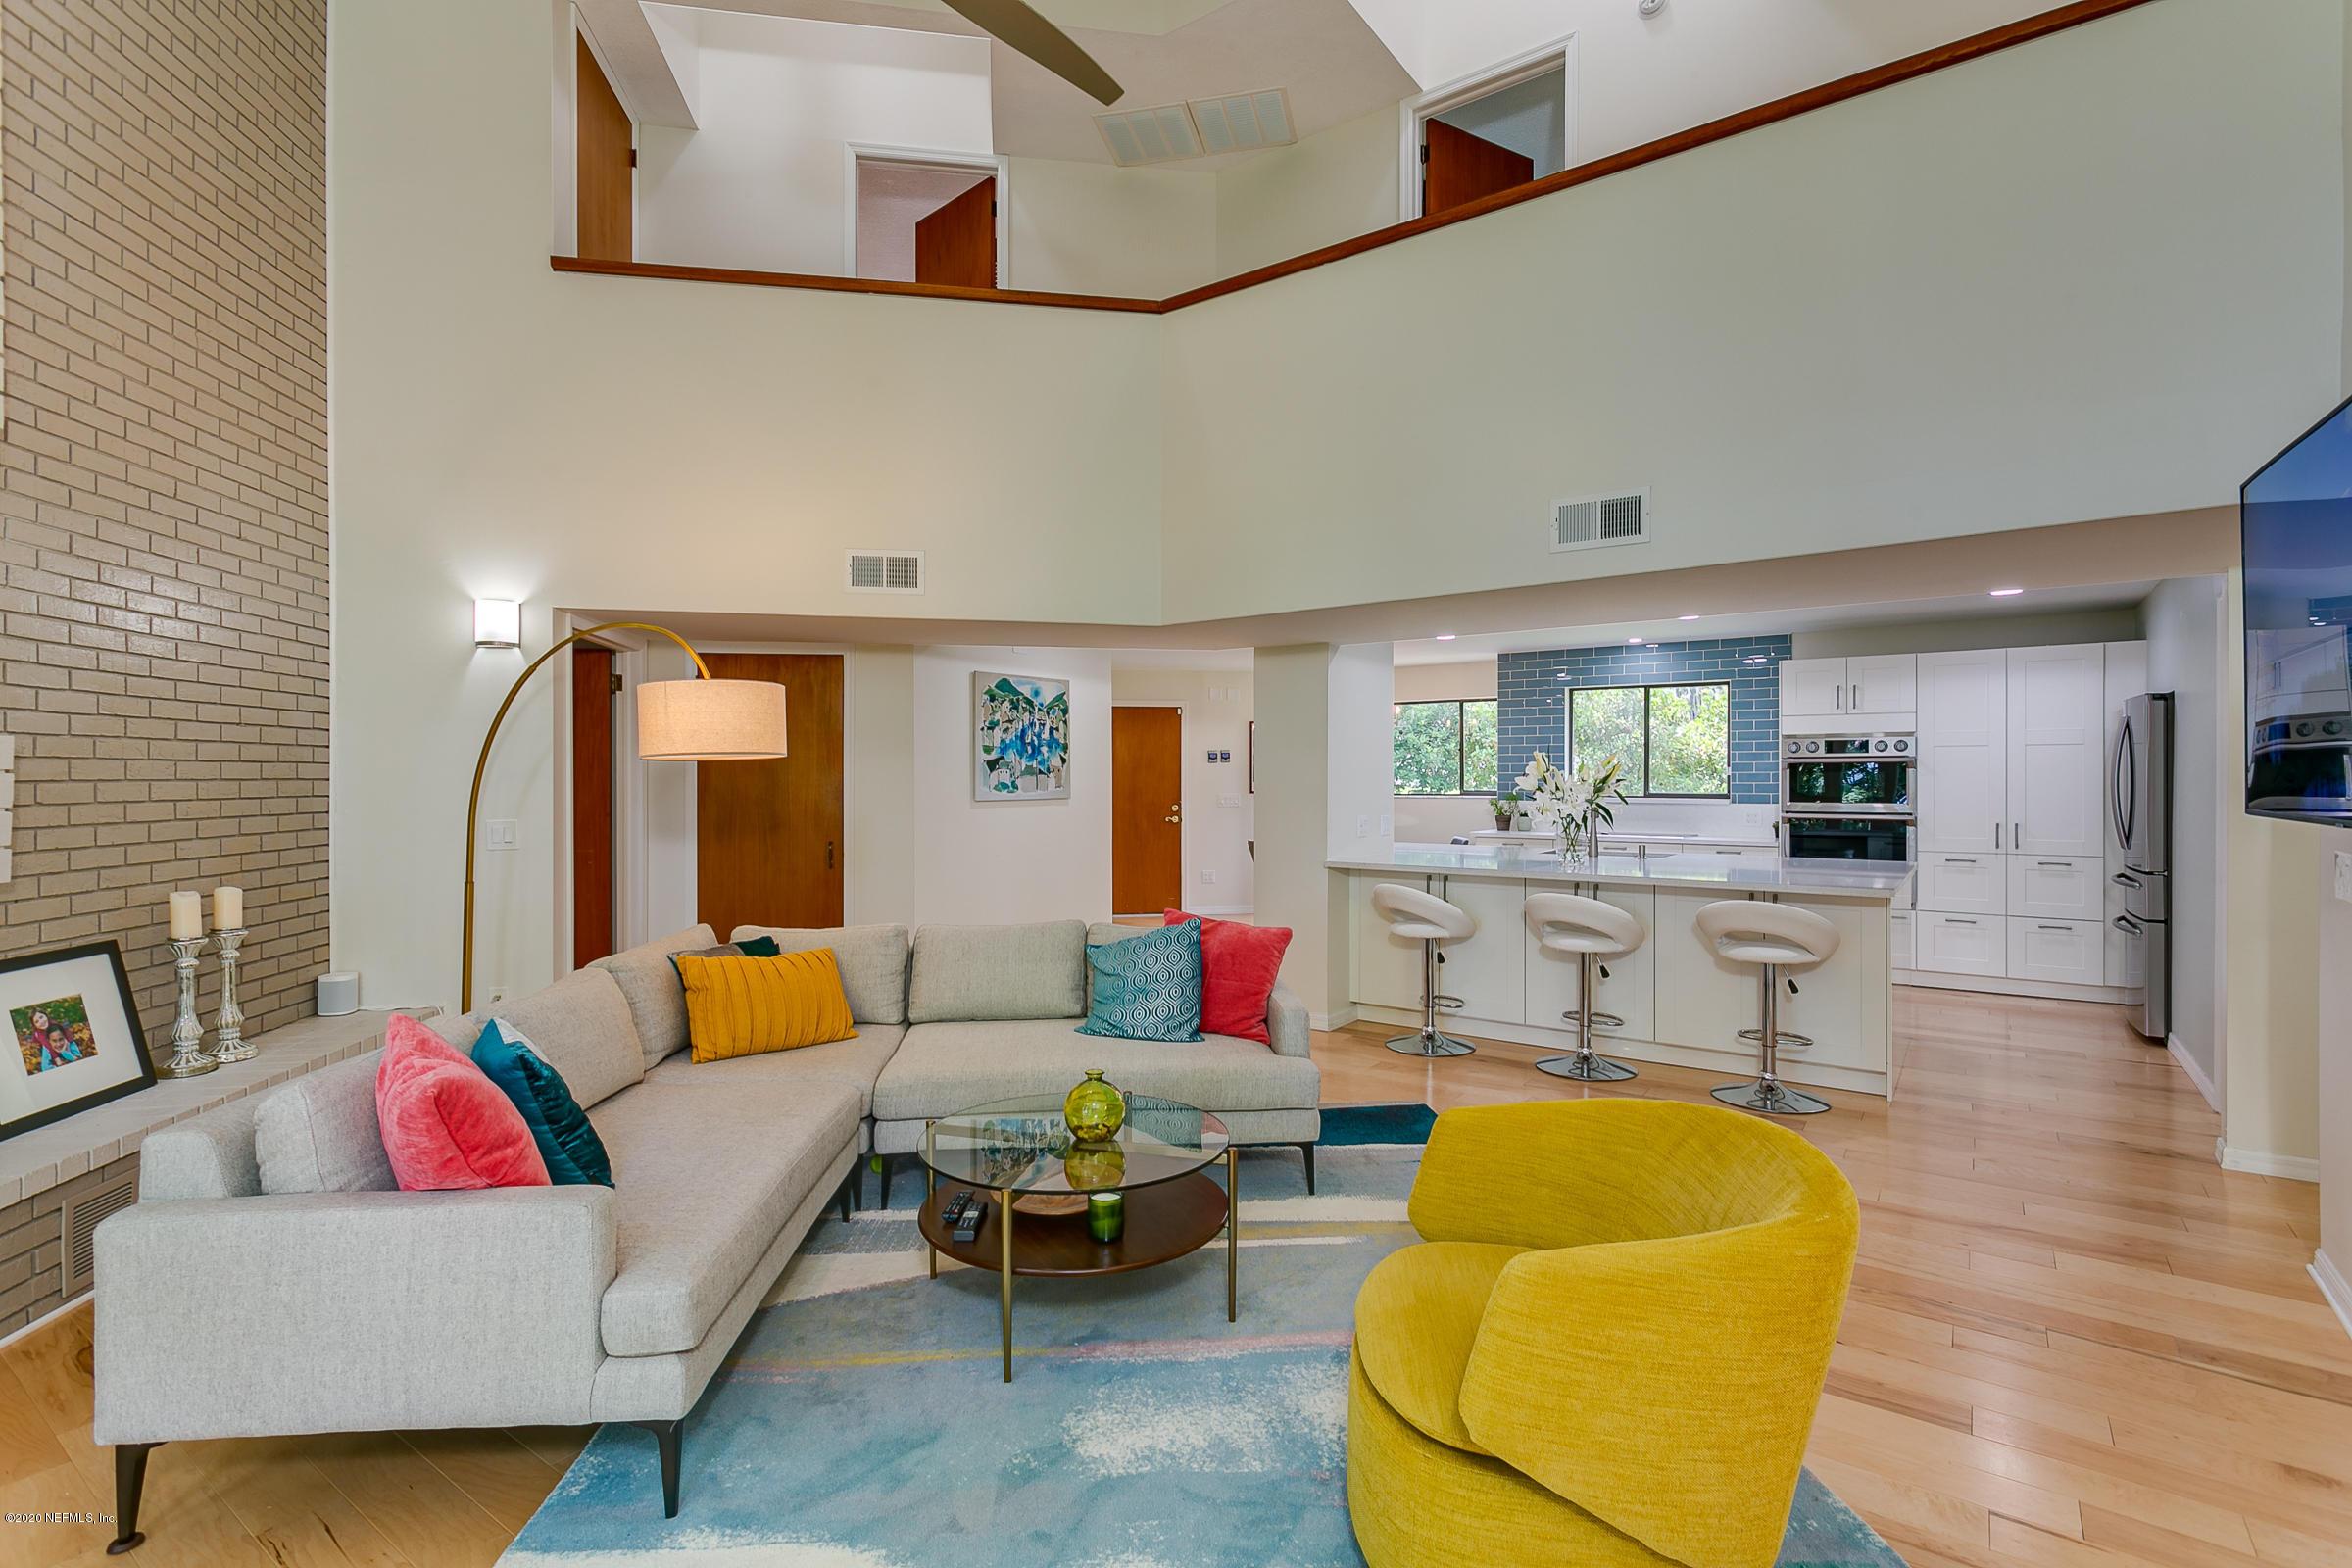 3175 DOCTORS LAKE, ORANGE PARK, FLORIDA 32073, 3 Bedrooms Bedrooms, ,2 BathroomsBathrooms,Residential,For sale,DOCTORS LAKE,1072312